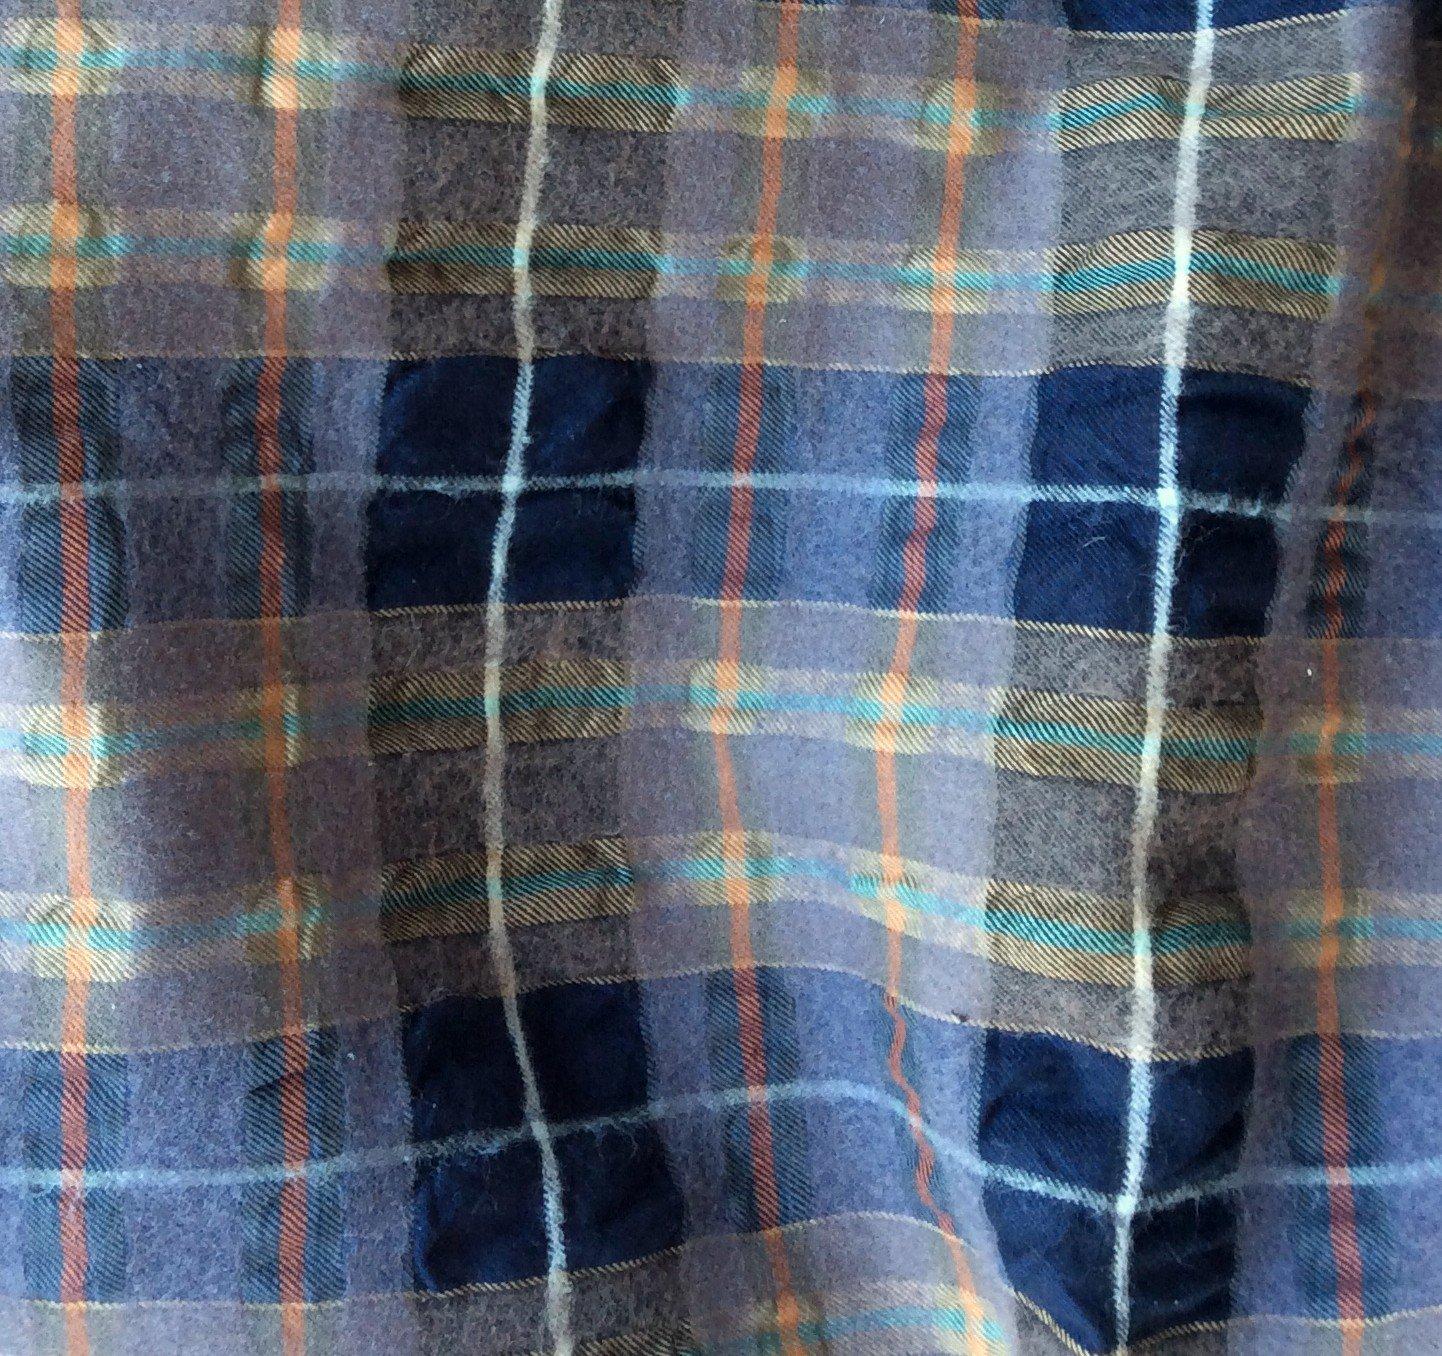 tissu ecossais marine gris orange cloqu vente de tissus. Black Bedroom Furniture Sets. Home Design Ideas